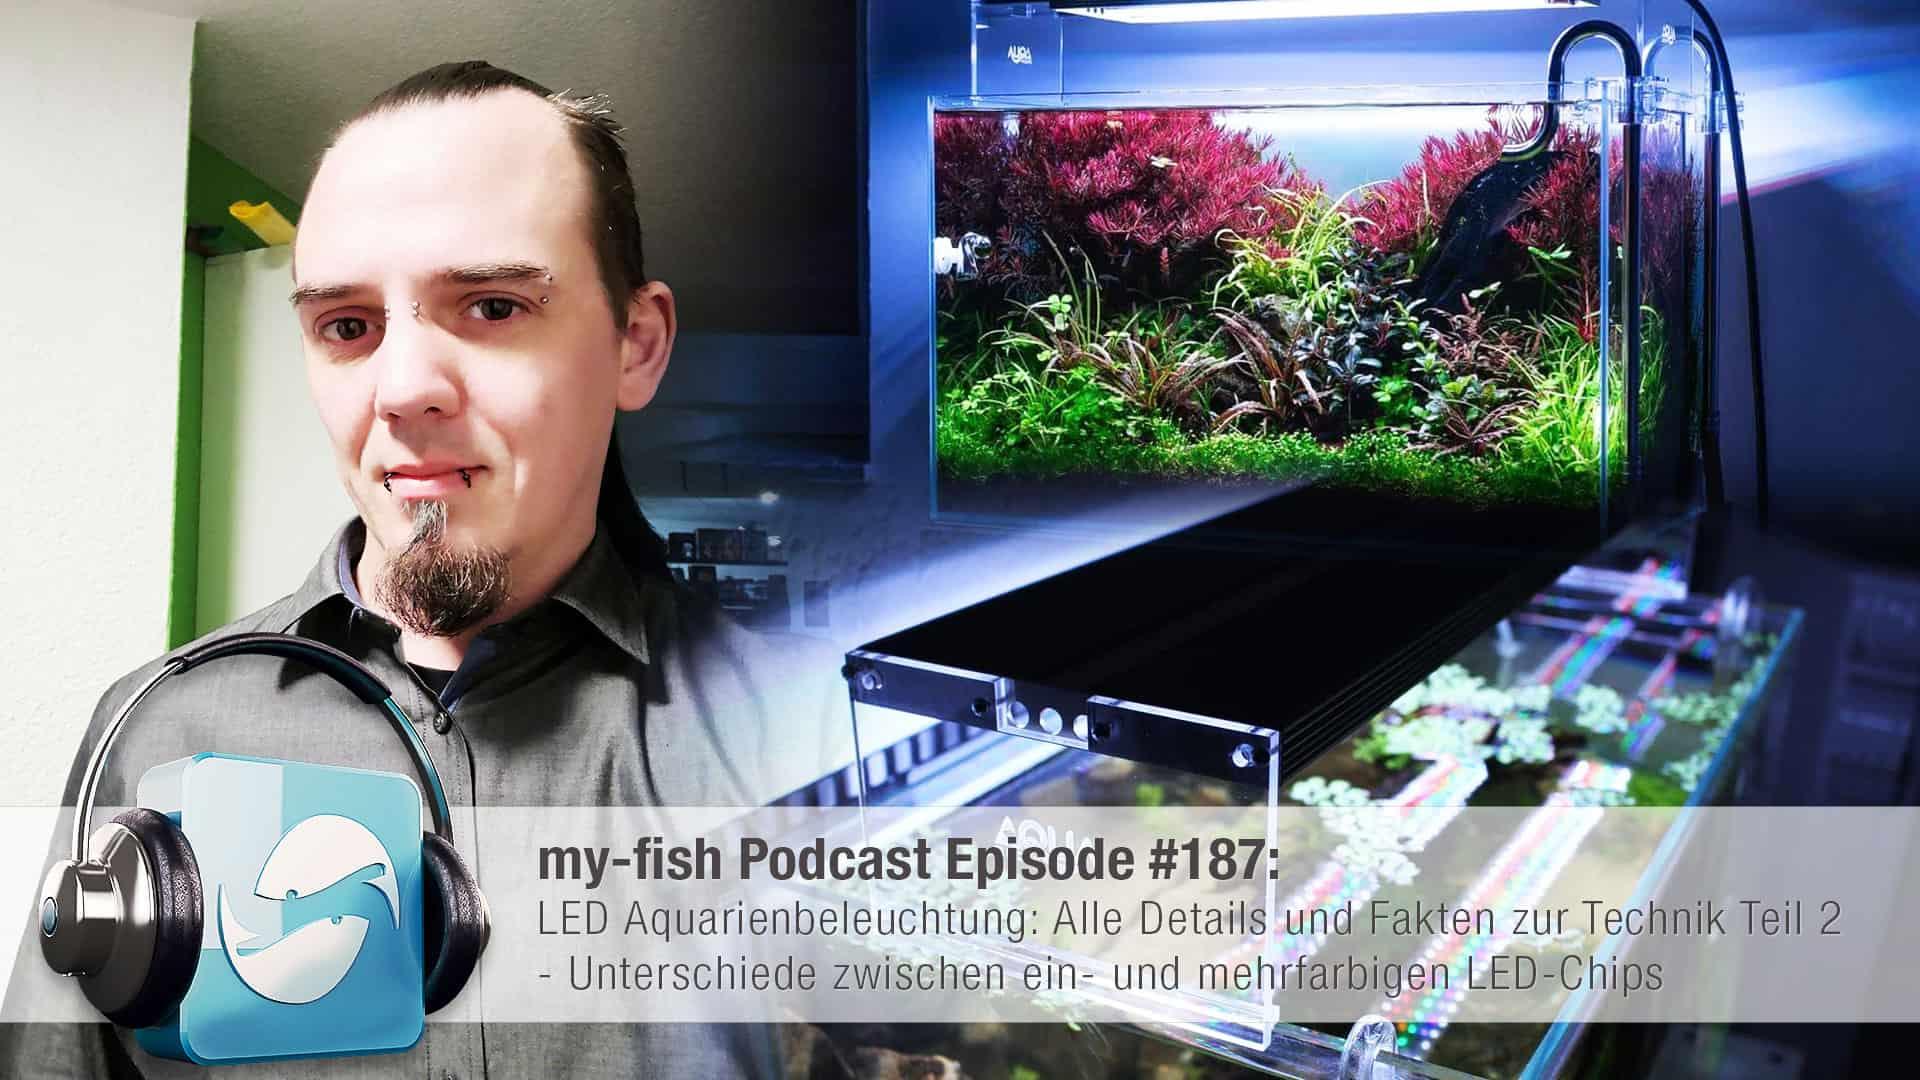 Podcast Episode #187: LED Aquarienbeleuchtung: Alle Details und Fakten zur Technik Teil 2 (Moritz Stapelfeld) 1